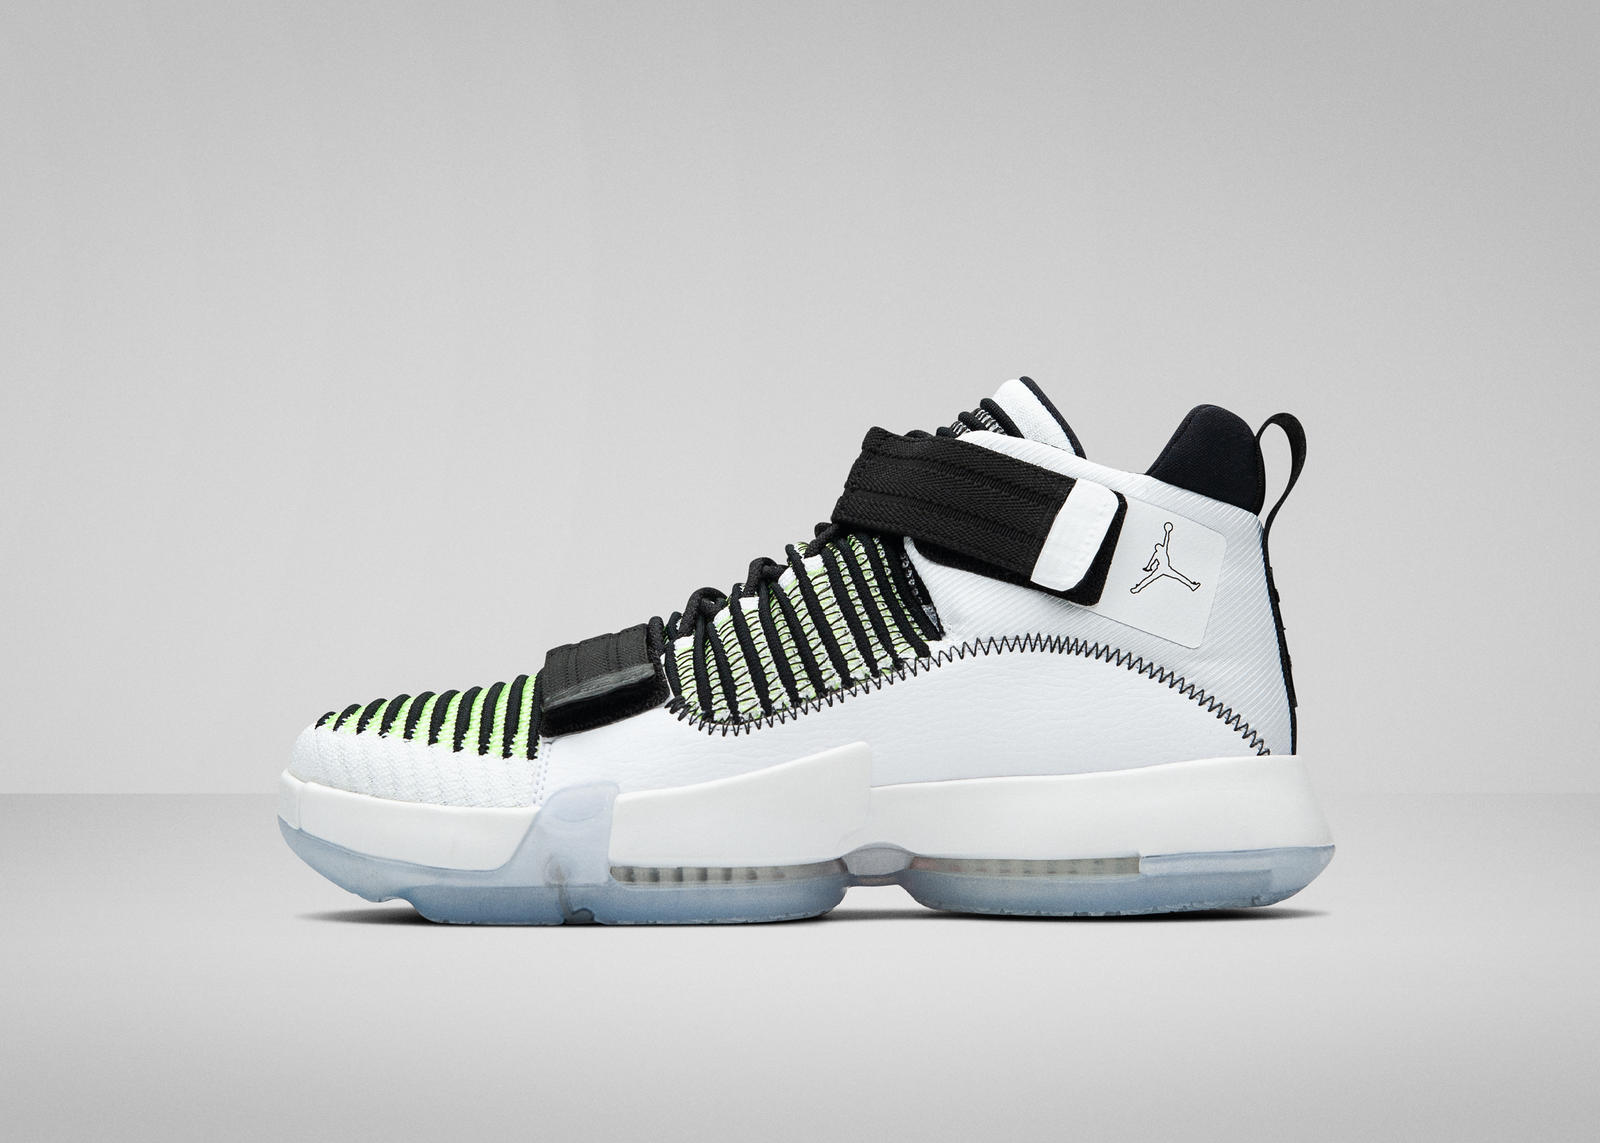 b90401d70097 Jimmy Butler Jordan Supreme Elevation - Nike News